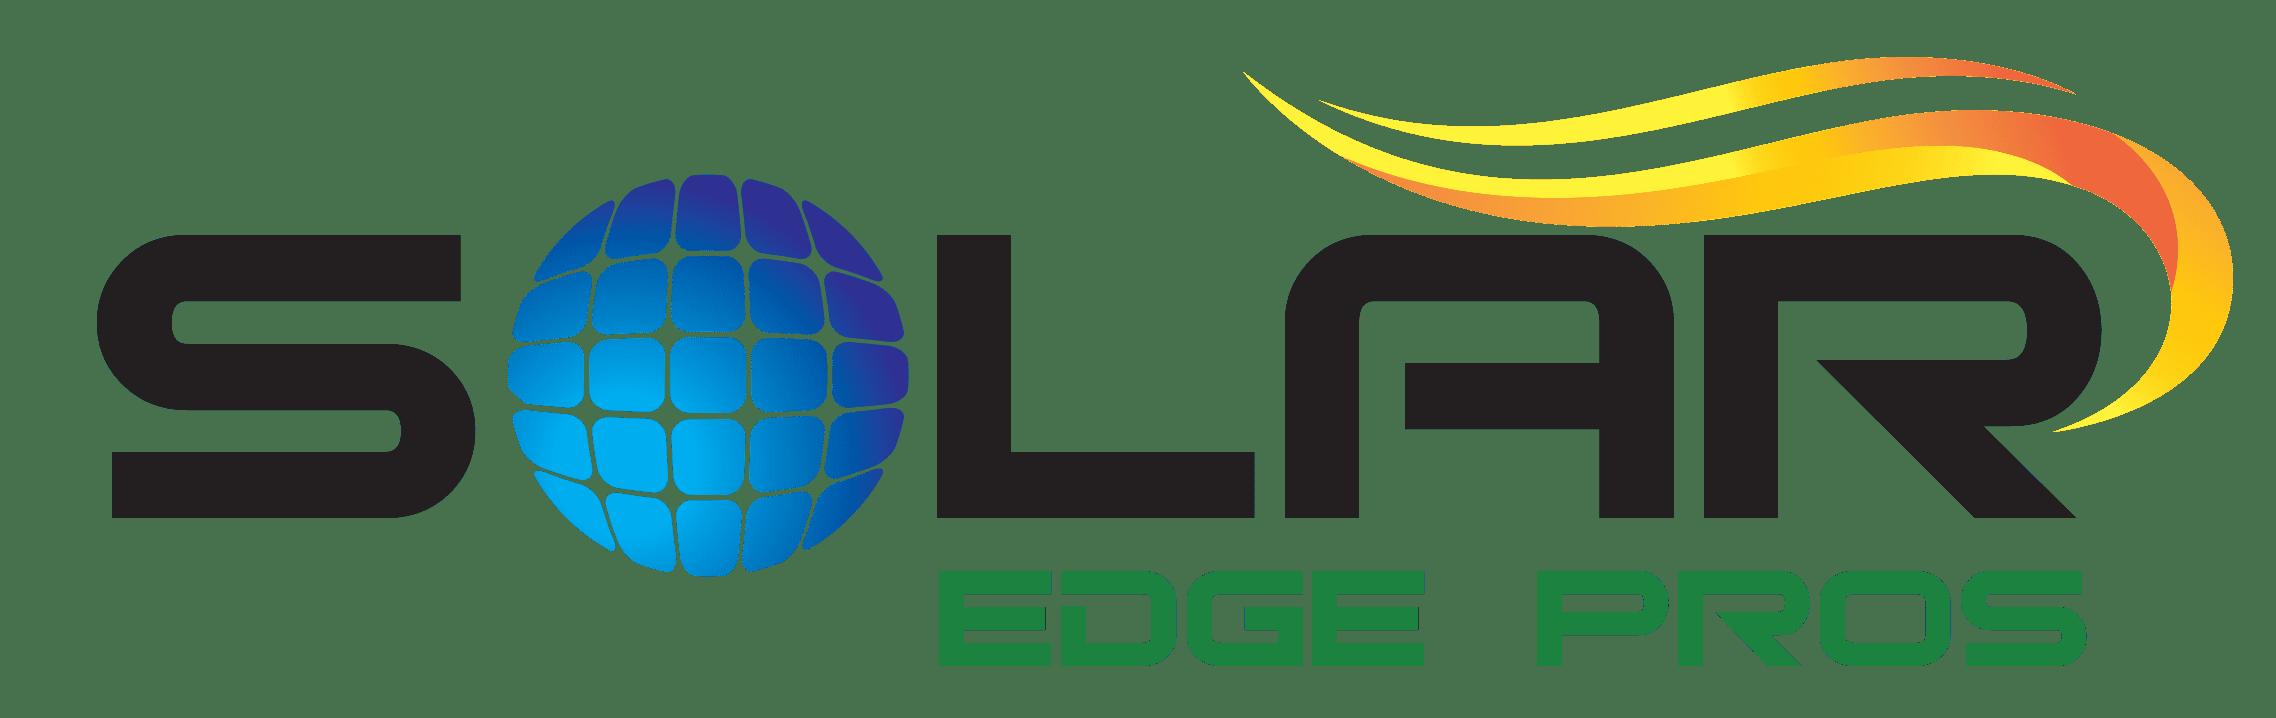 Solar-Edge-Pro-Logo-015-2 Final Horizontal